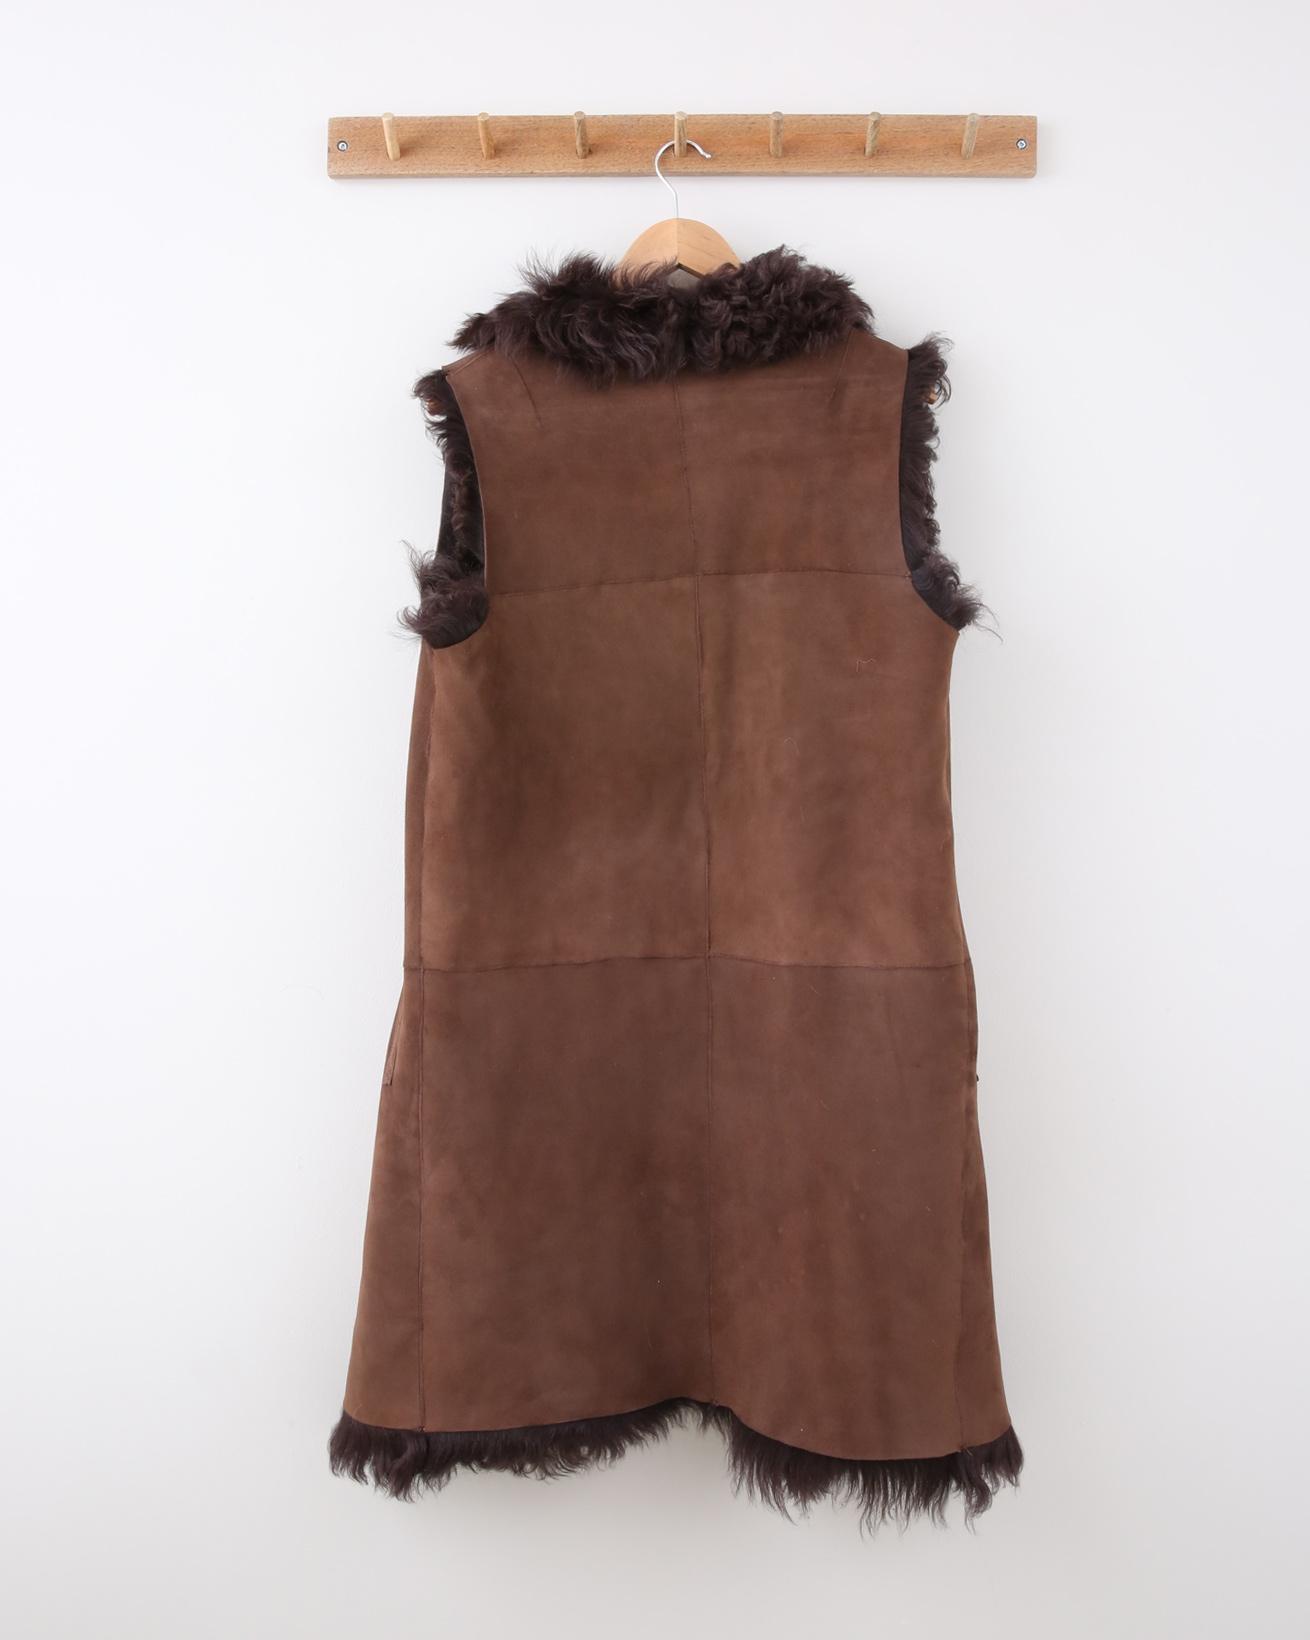 1503-reversible-himilayan-curly-gilet-mahogany-brown-reversed-back.jpg